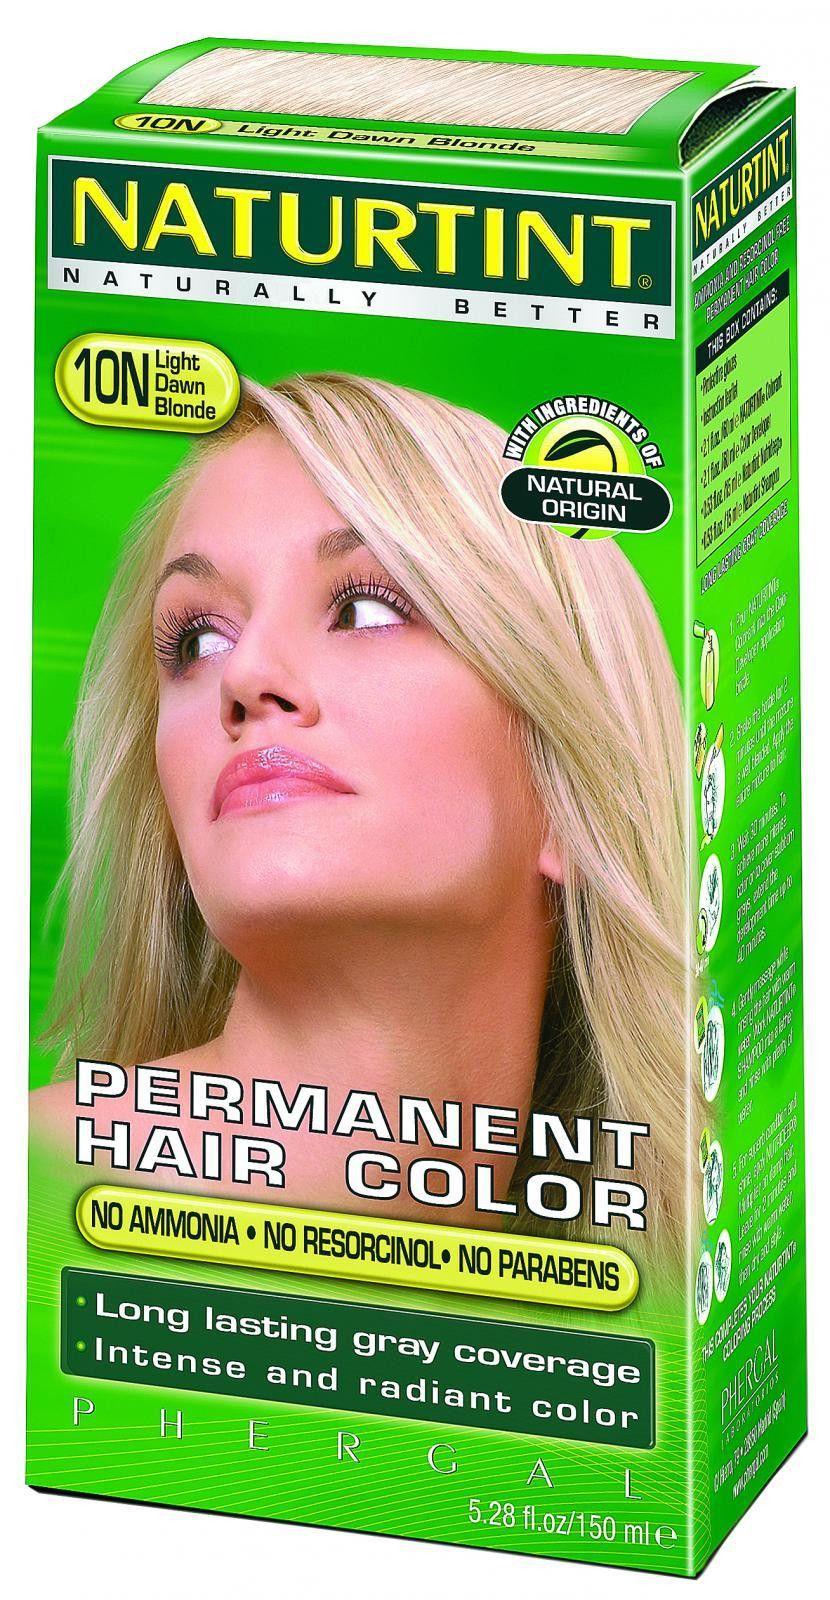 Naturtint Hair Color Permanent 10n Light Dawn Blonde 528 Oz